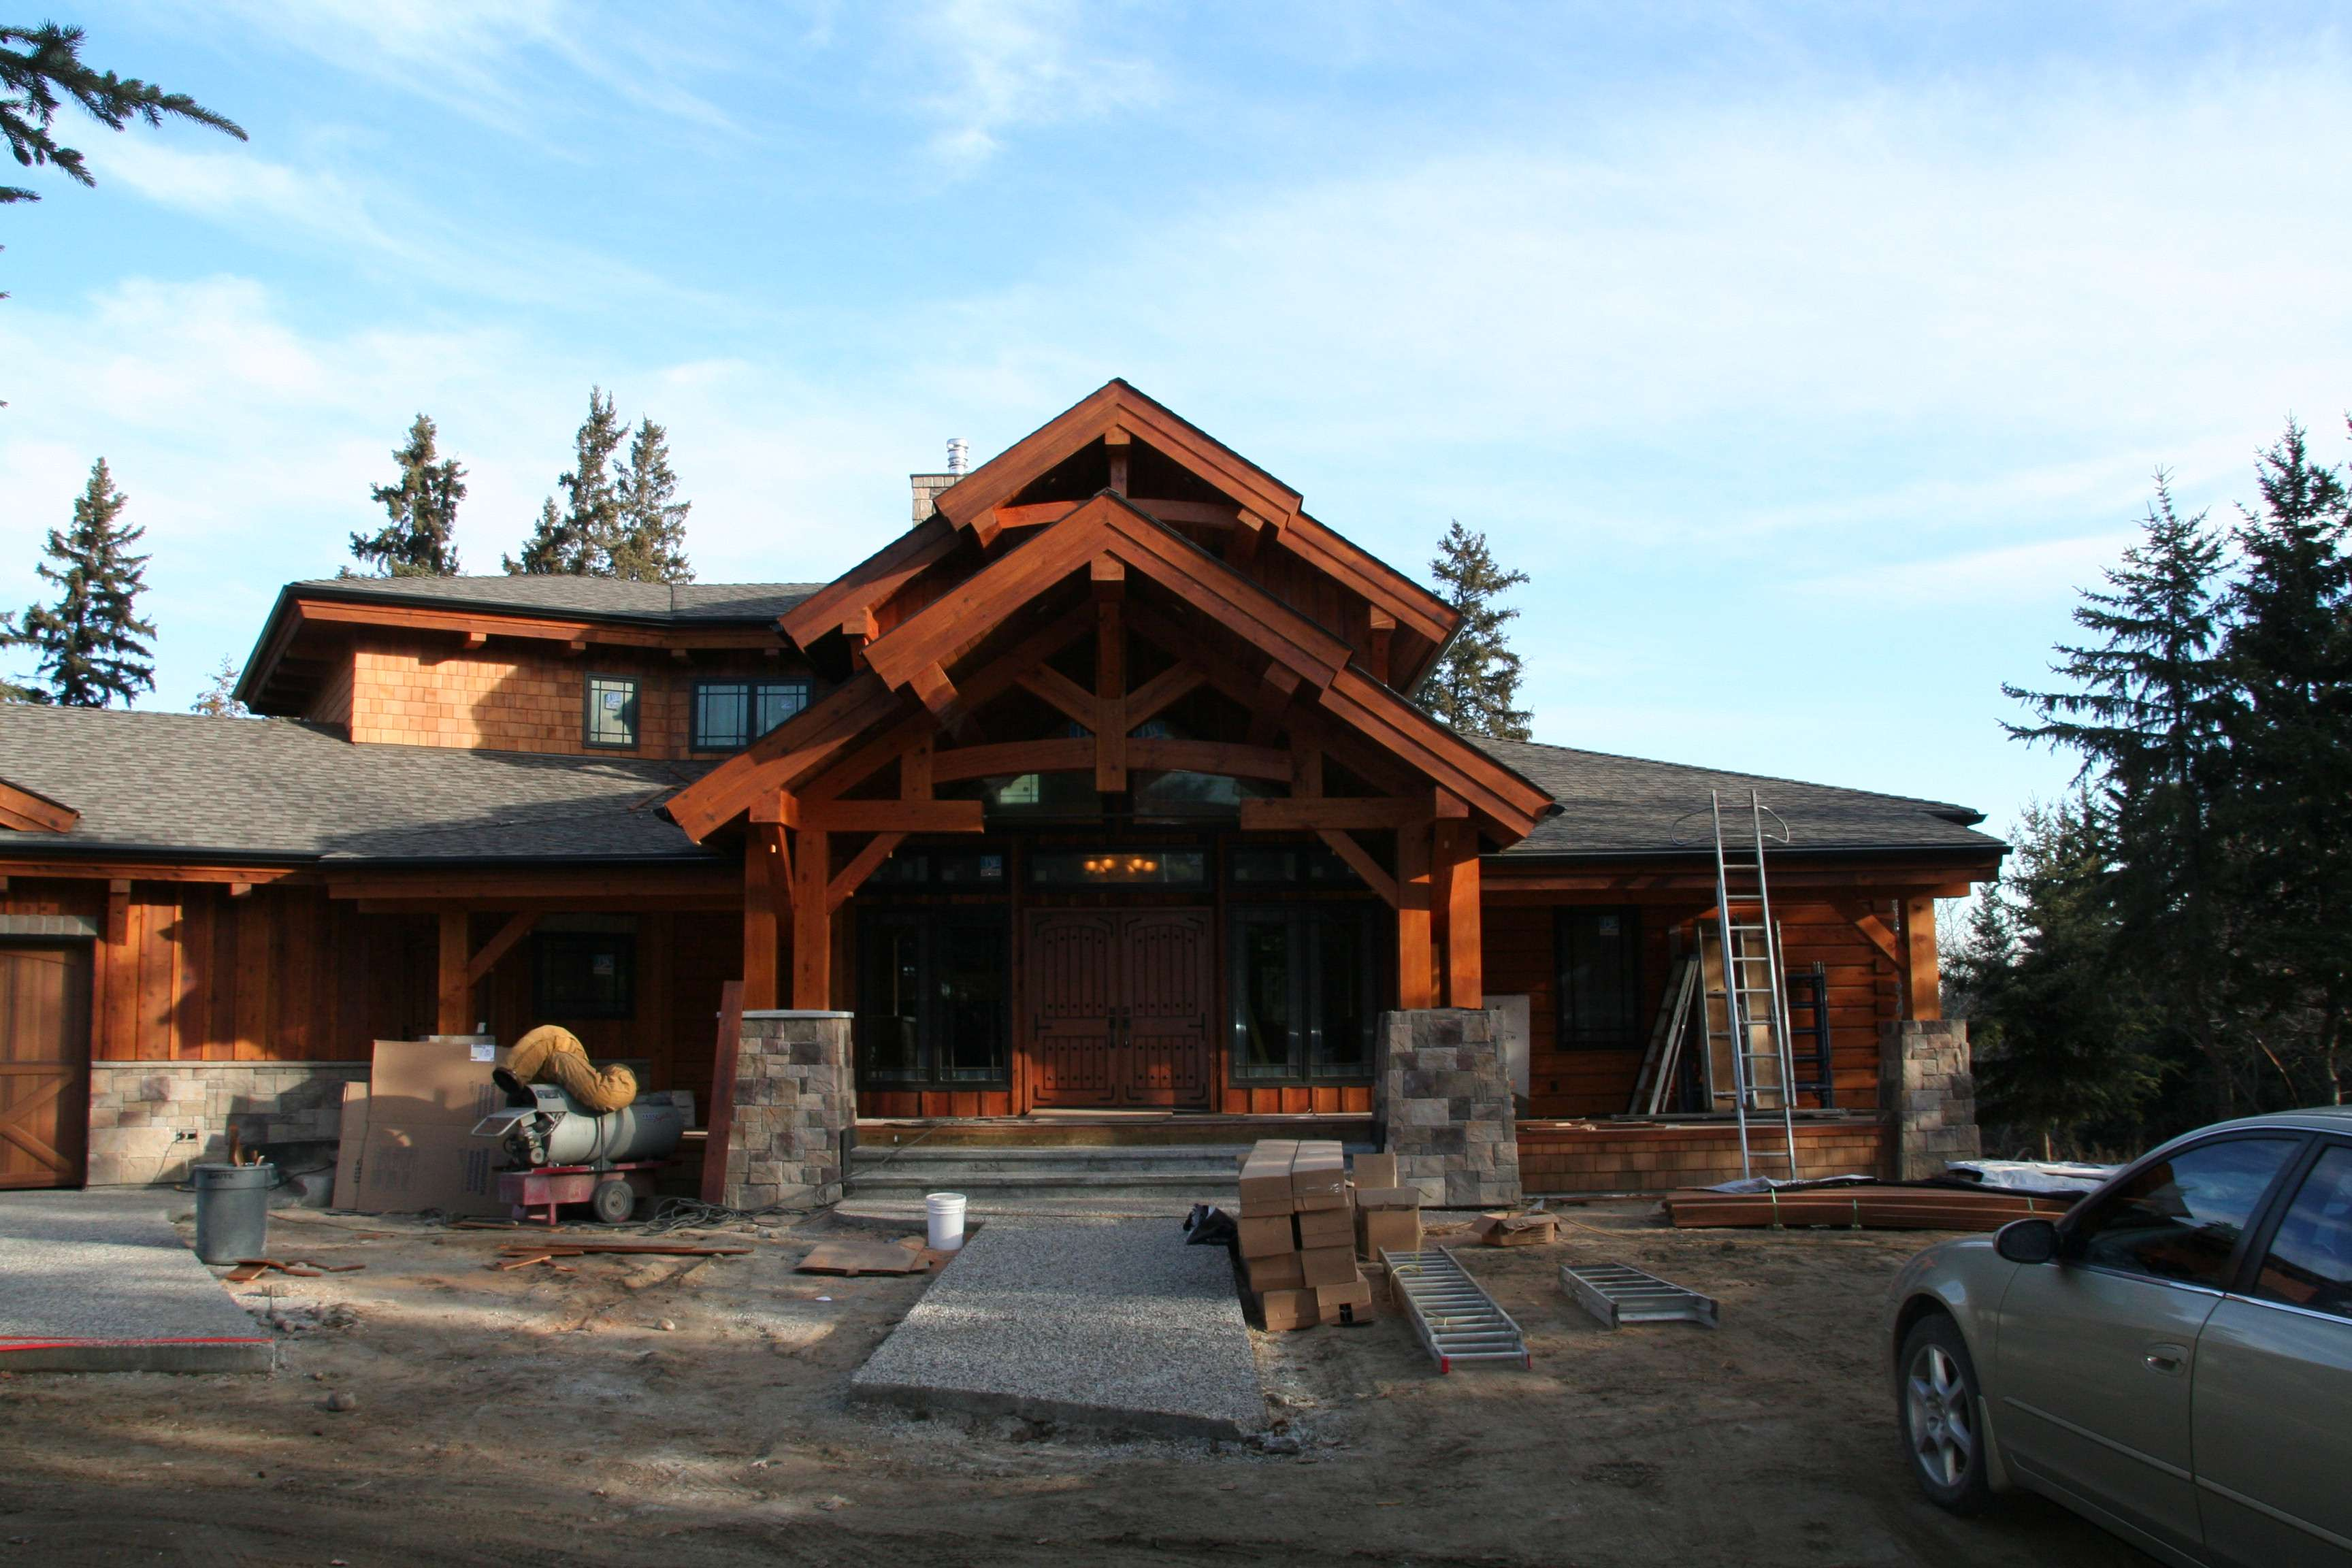 Timber Frame Log Homes Precisioncraft Wood River Home Plan